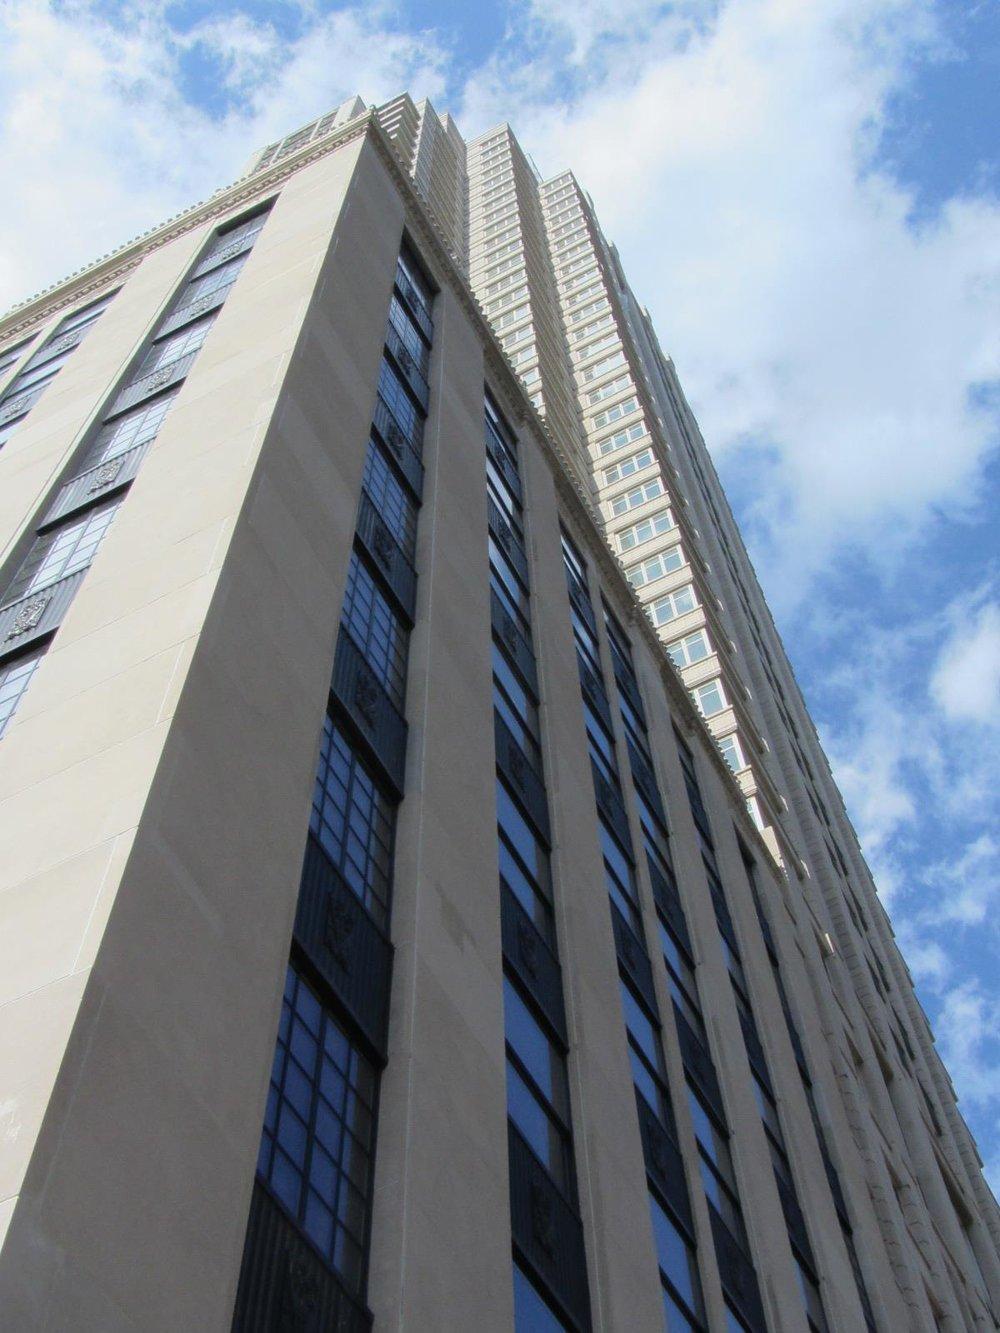 Ritz Carlton Residences   118 East Erie Street  Chicago, Illinois    More information